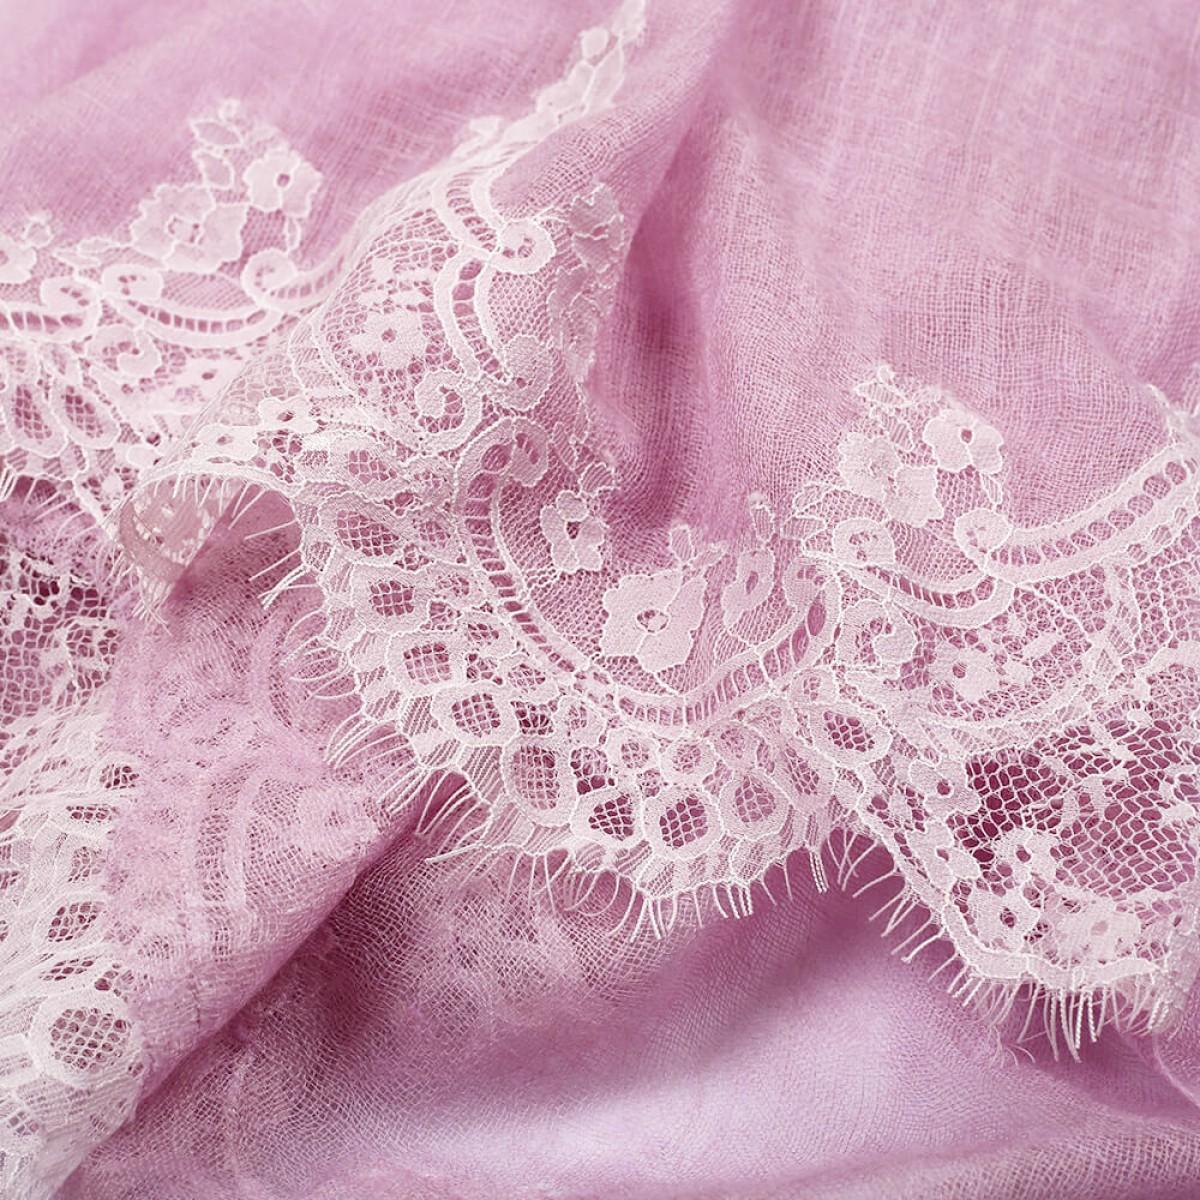 Lace Sheer Pashmina Scarf - Lilac